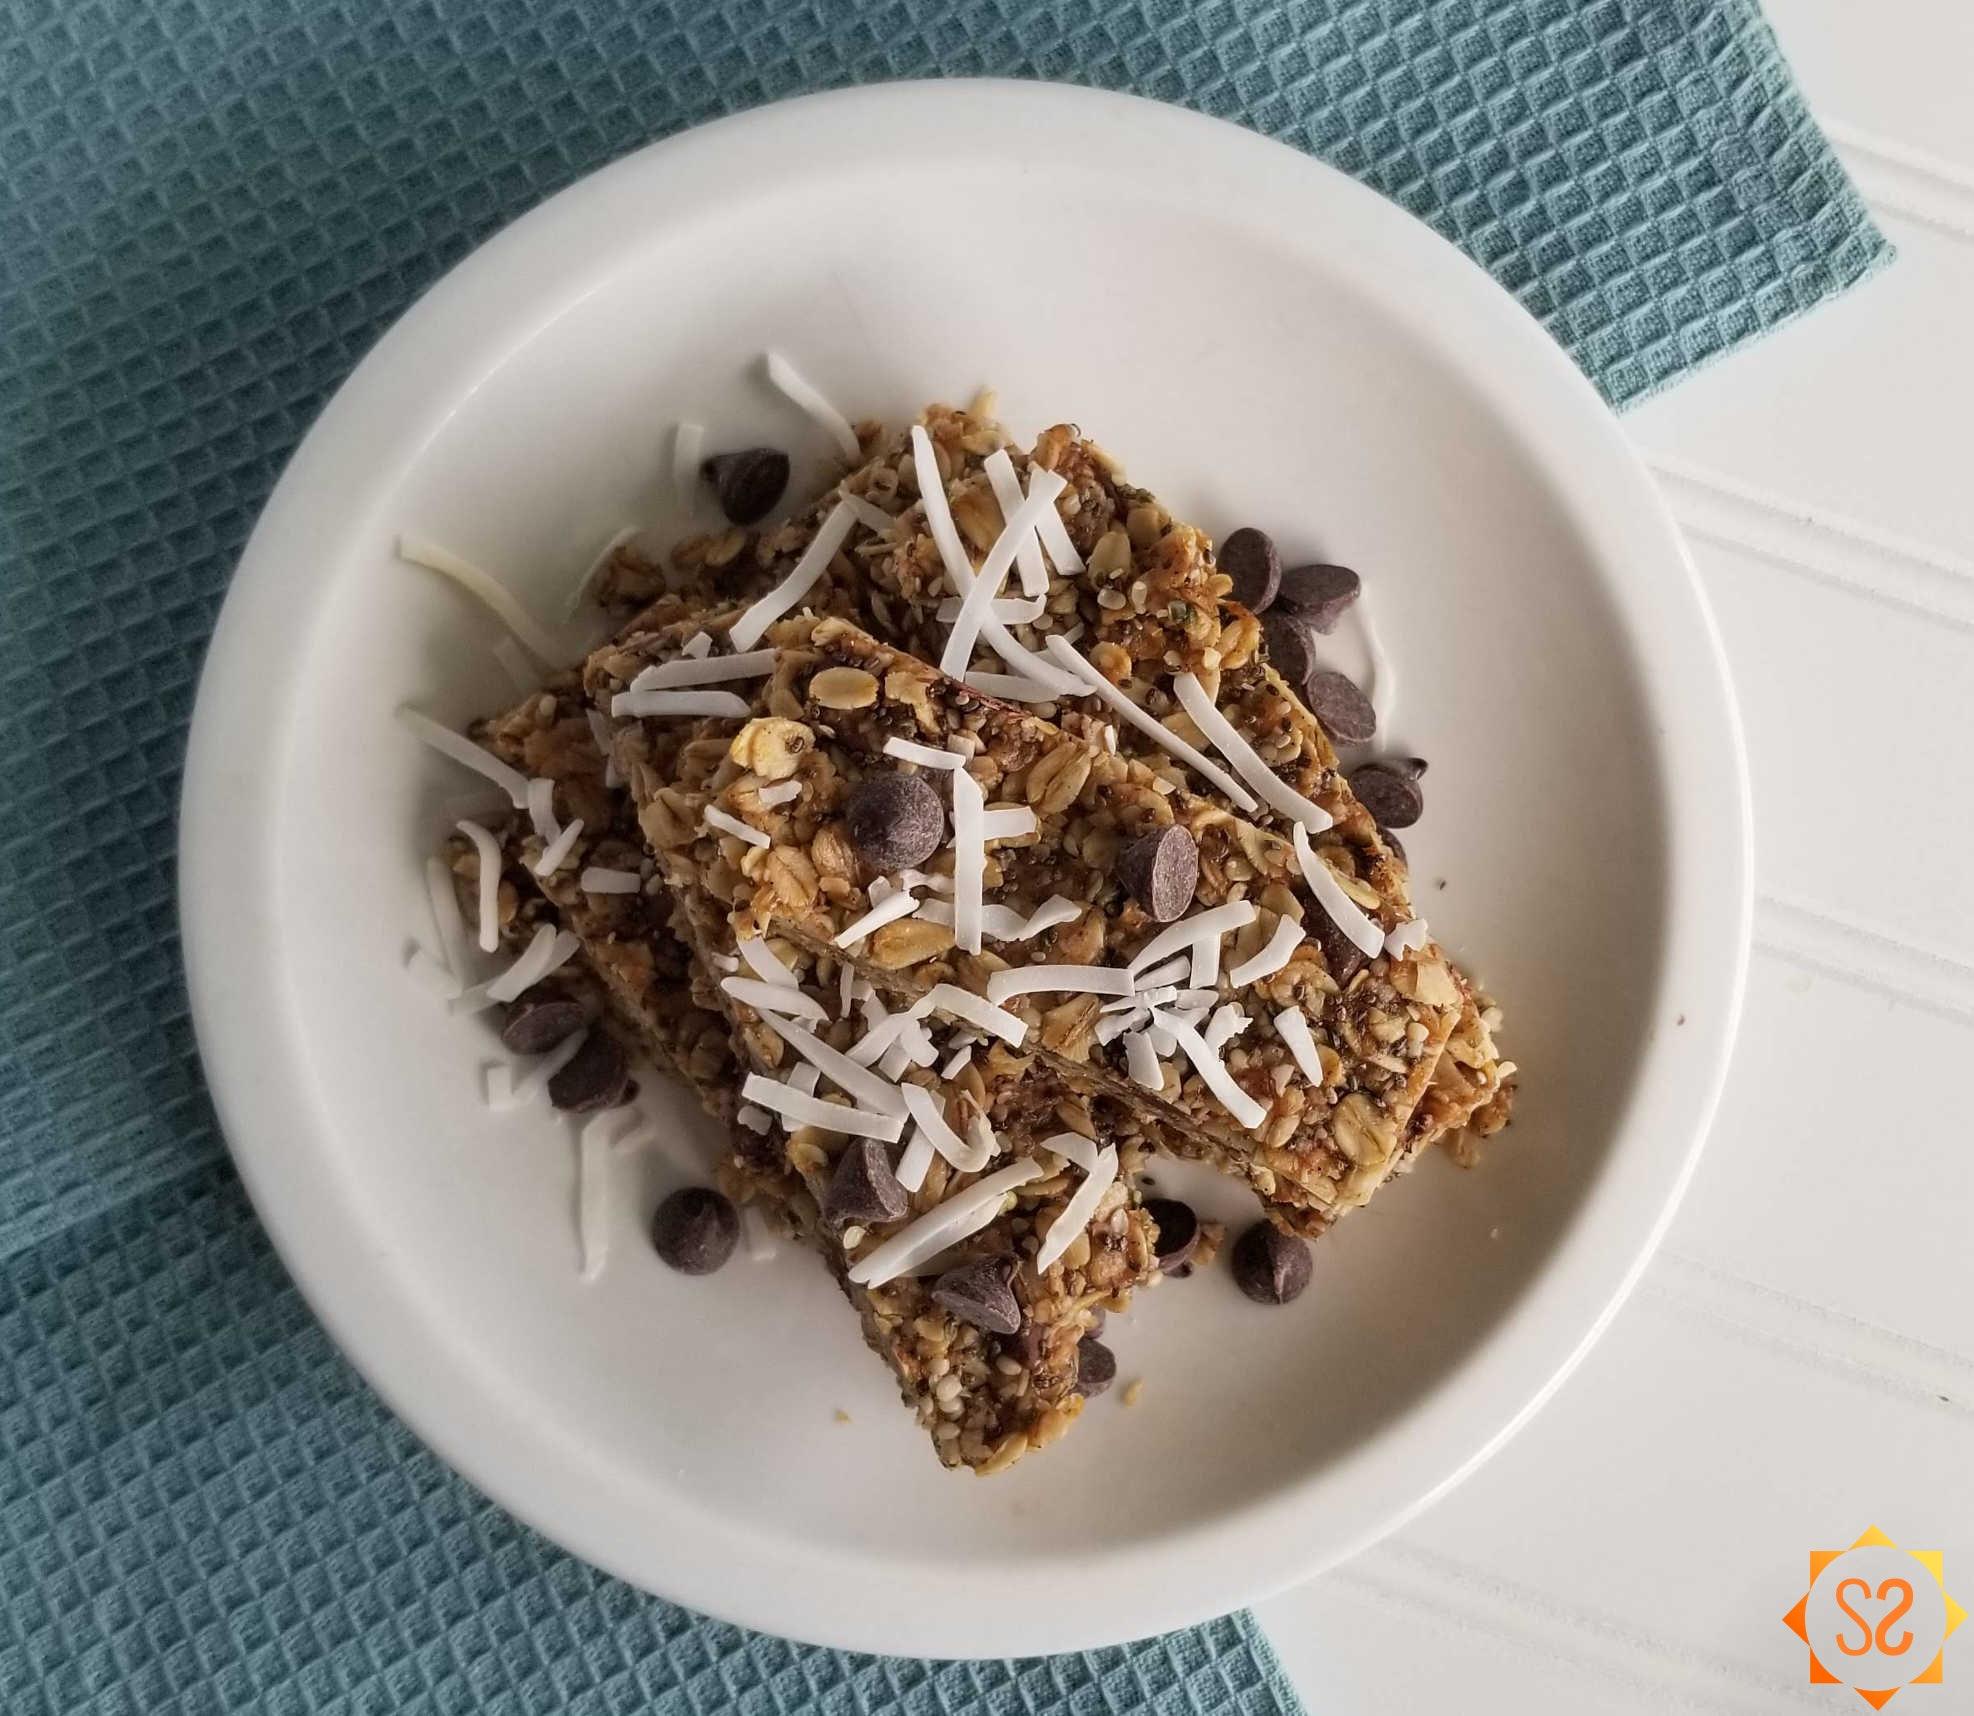 Granola bars on a plate